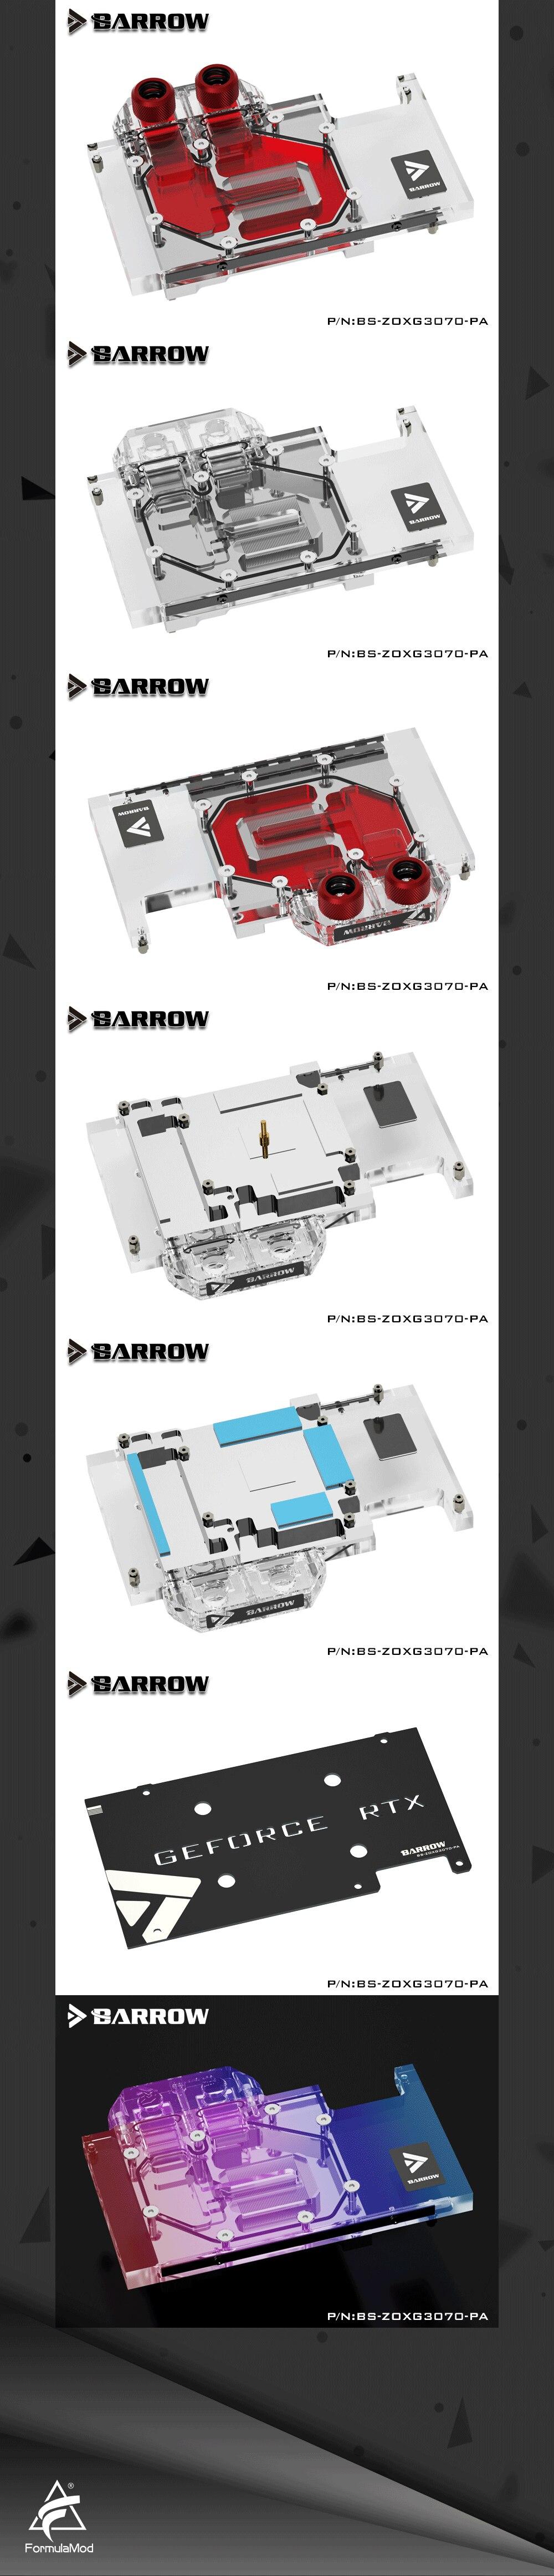 Barrow 3070 GPU Water Block for ZOTAC Geforce RTX 3070 X-GAMING OC, Full Cover ARGB GPU Cooler, BS-ZOXG3070-PA